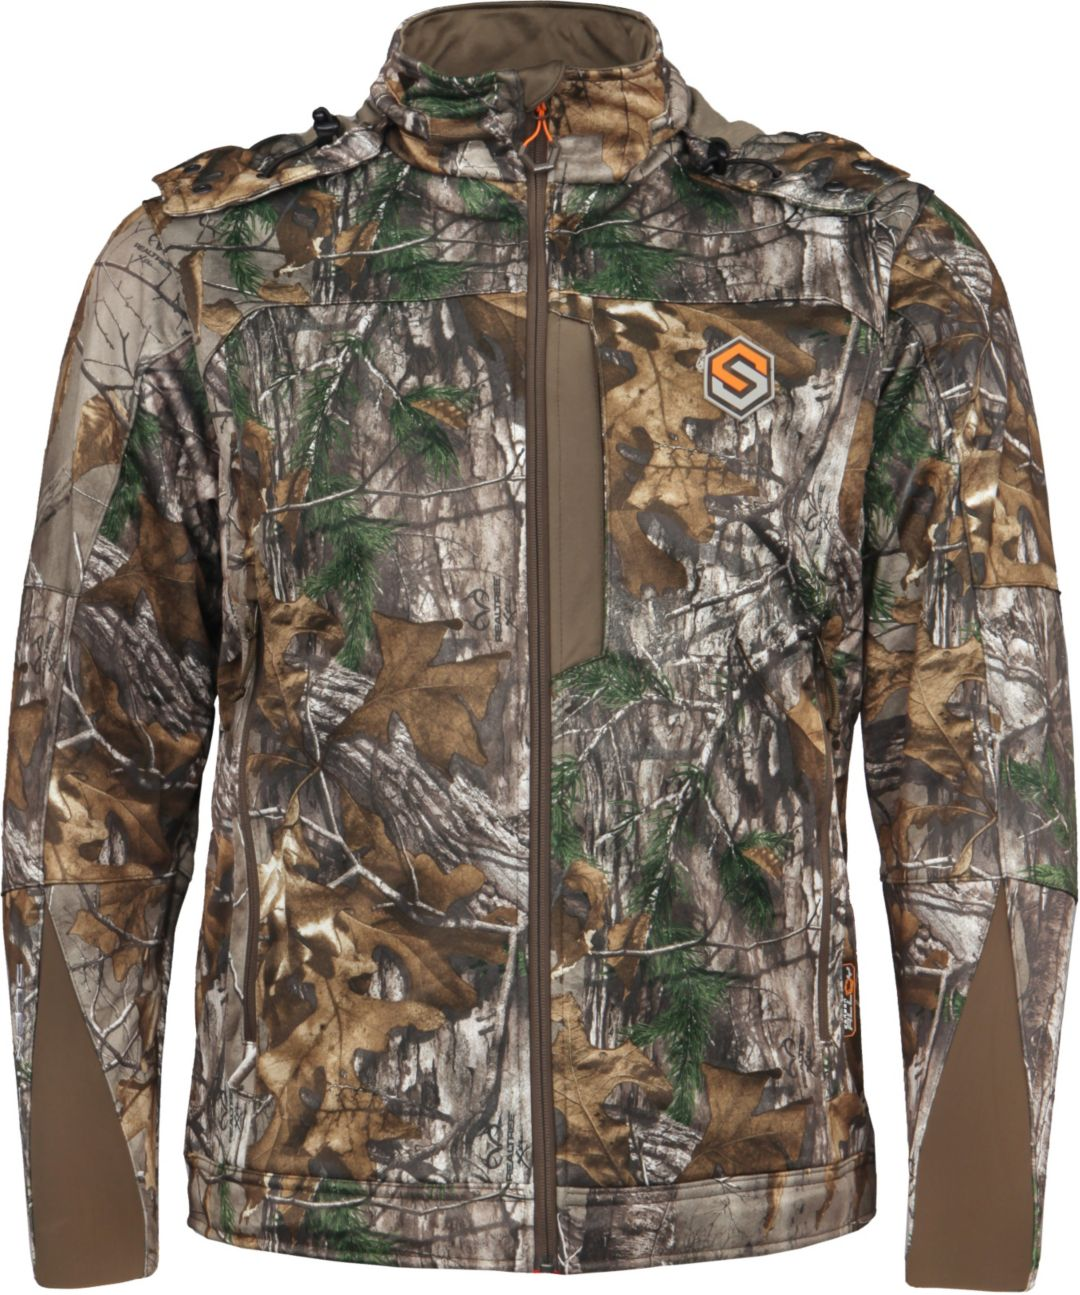 530280e0da588 ScentLok Men's Helix Soft Shell Hunting Jacket | Field & Stream